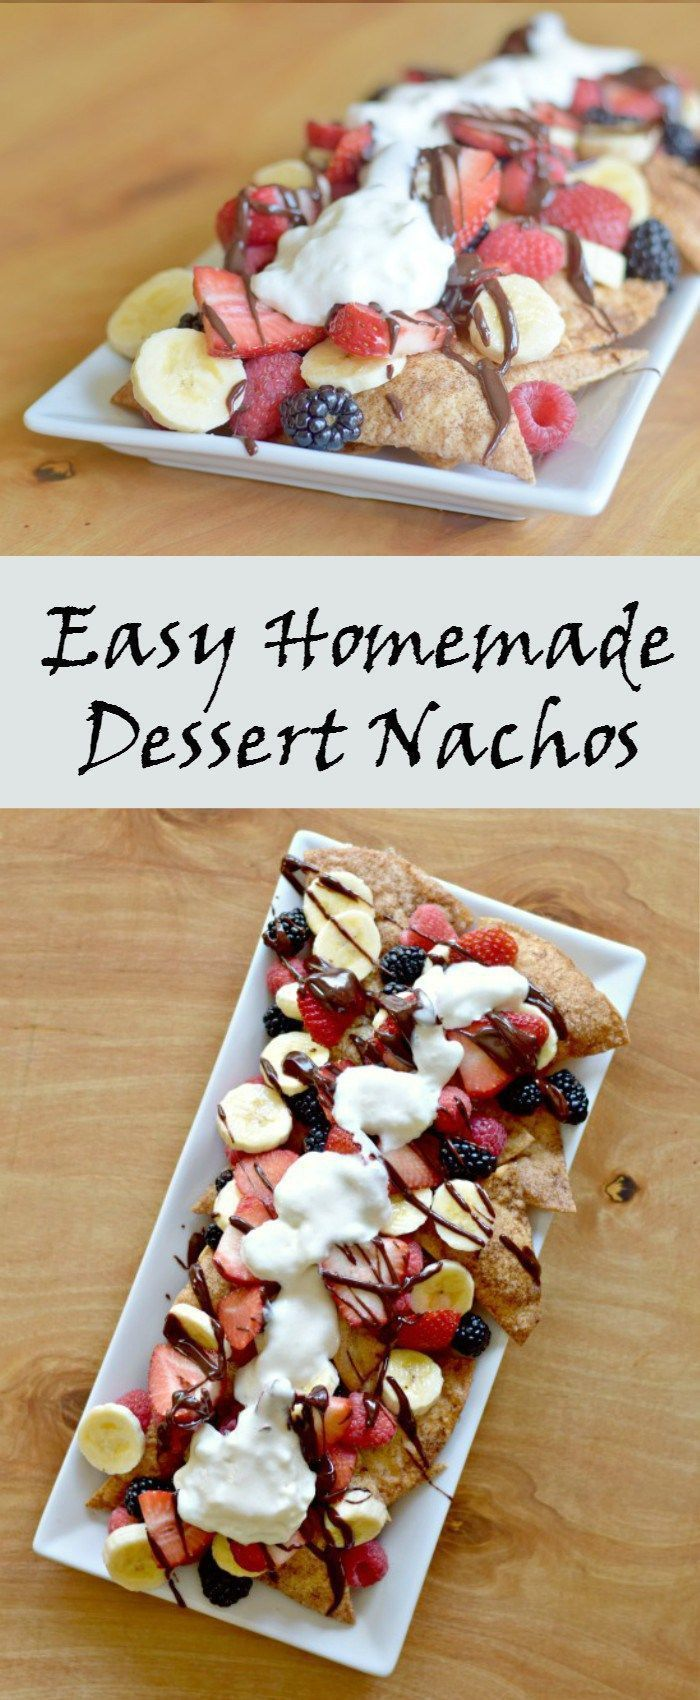 Easy homemade dessert nachos recipe with cinnamon sugar